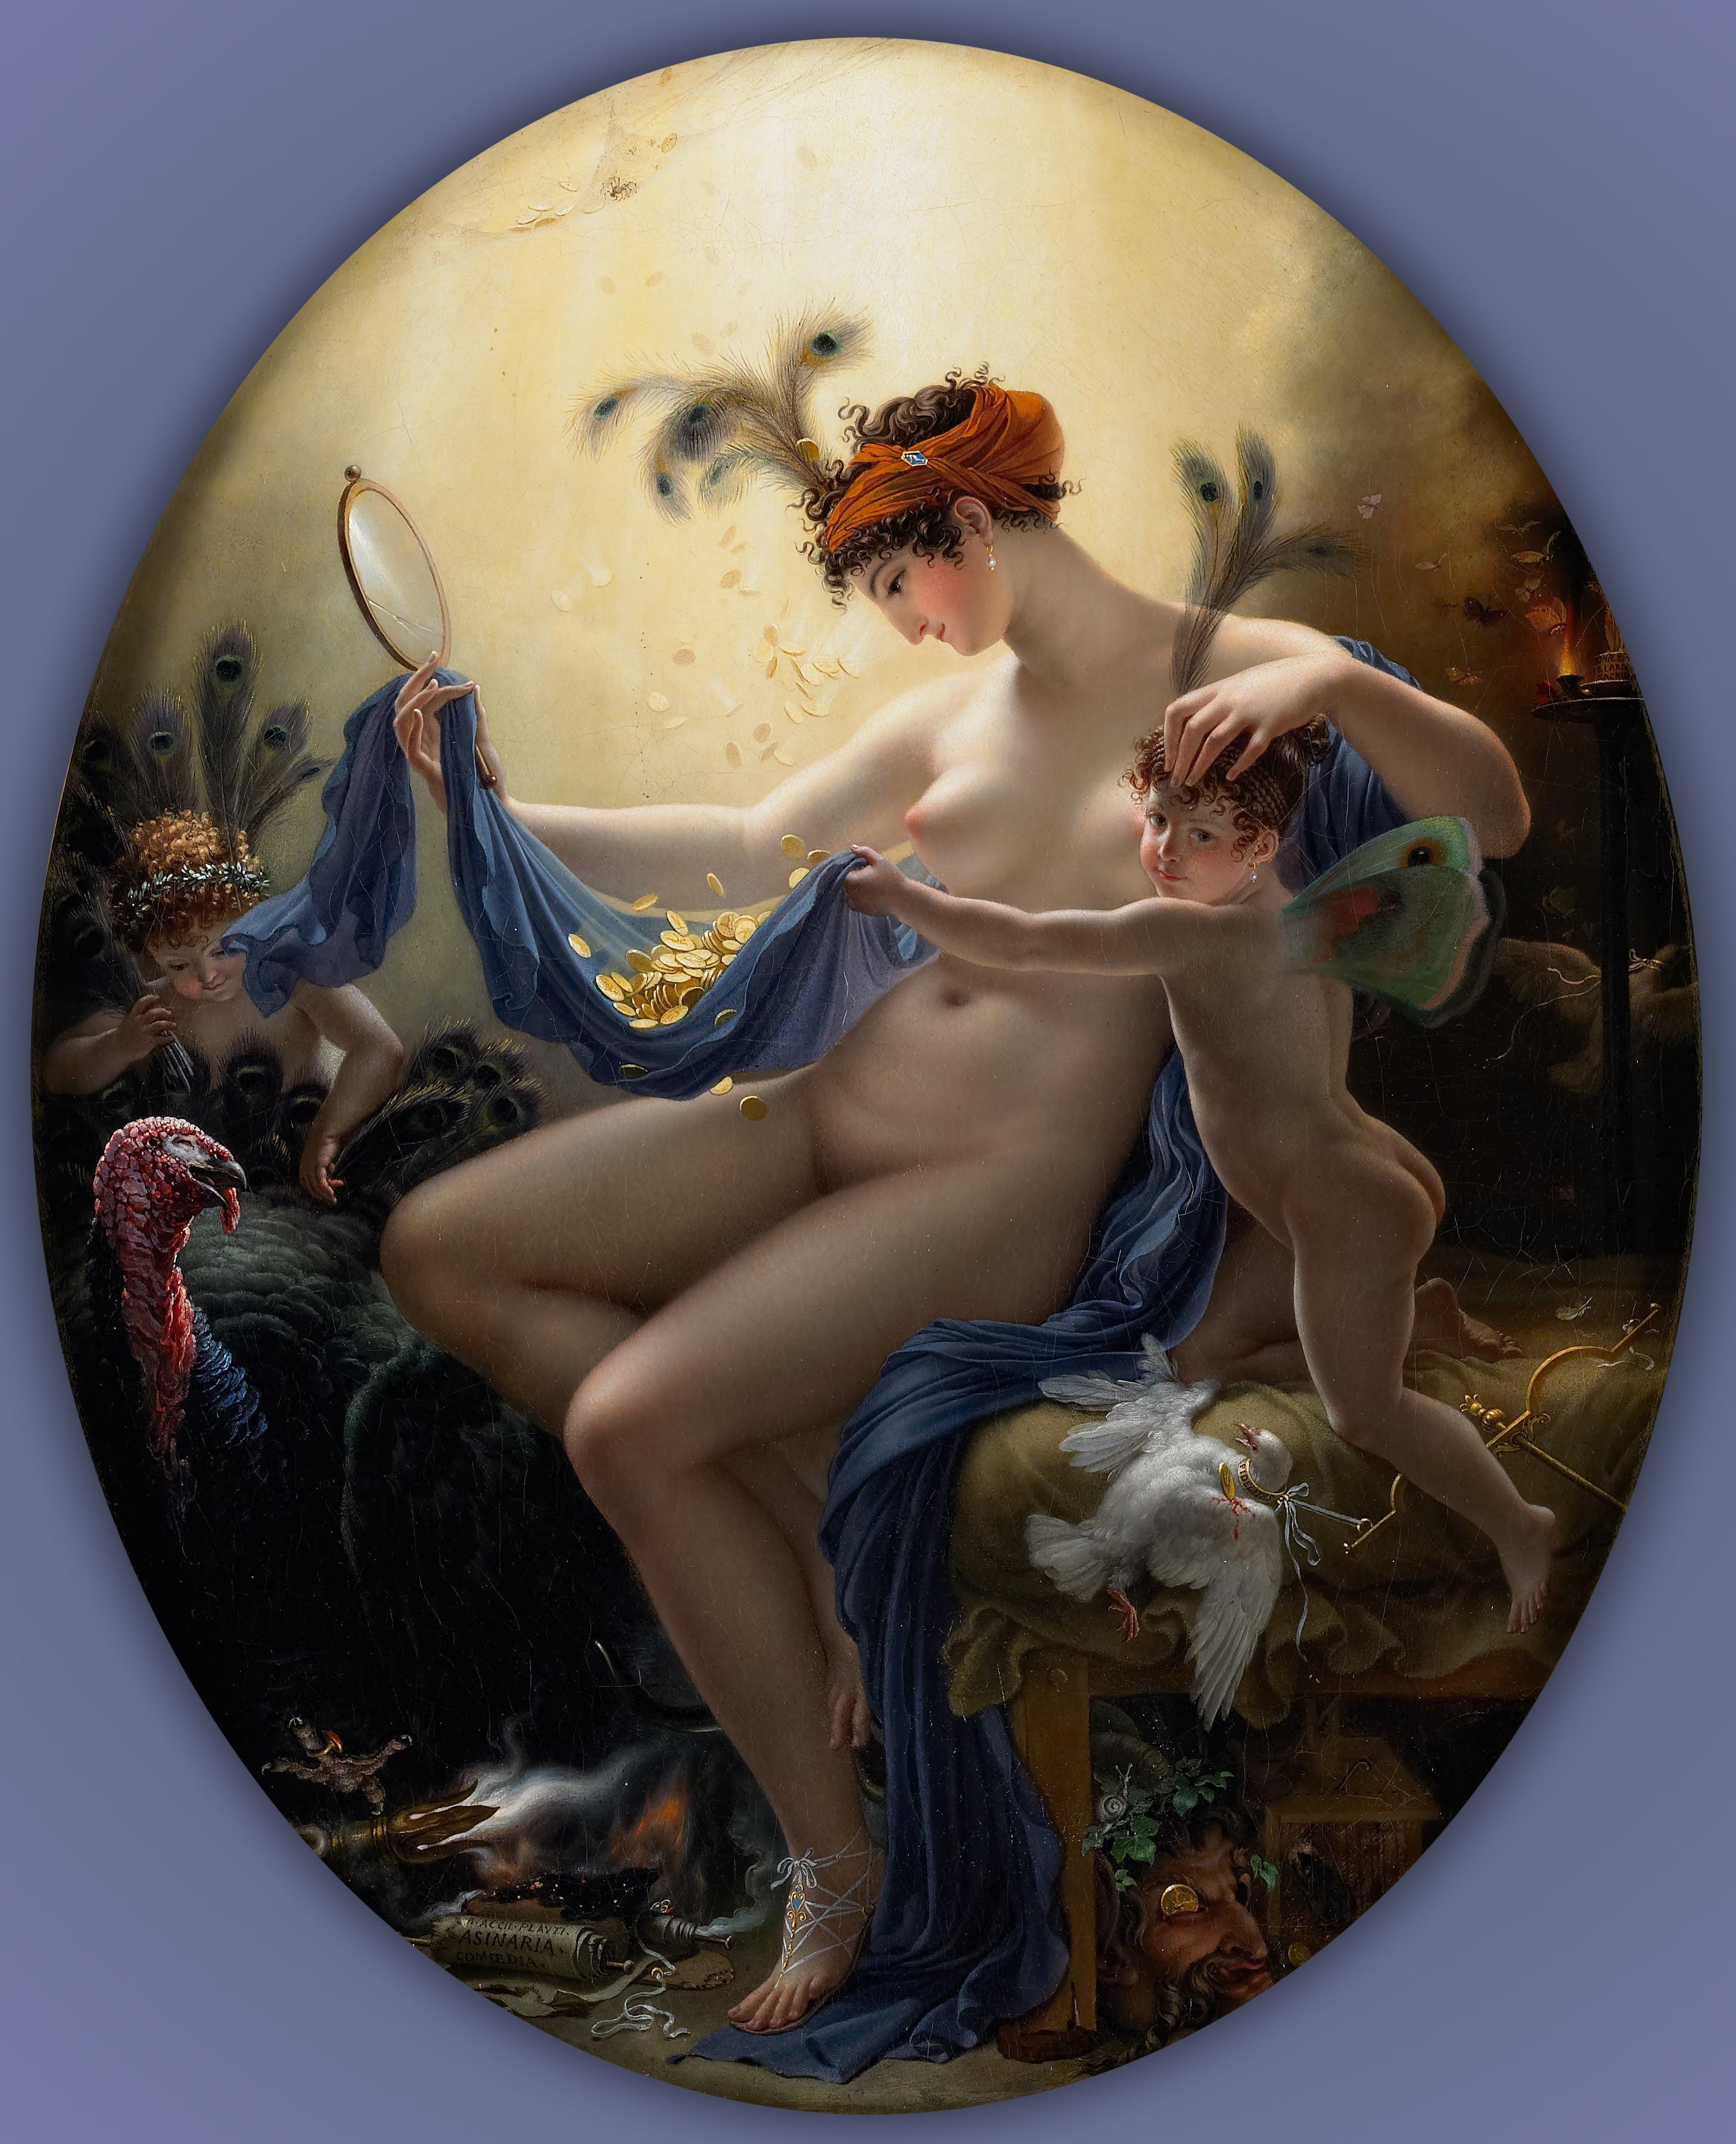 Figura 22 - Anne-Louis Girodet, Mlle. Lange como Dânae